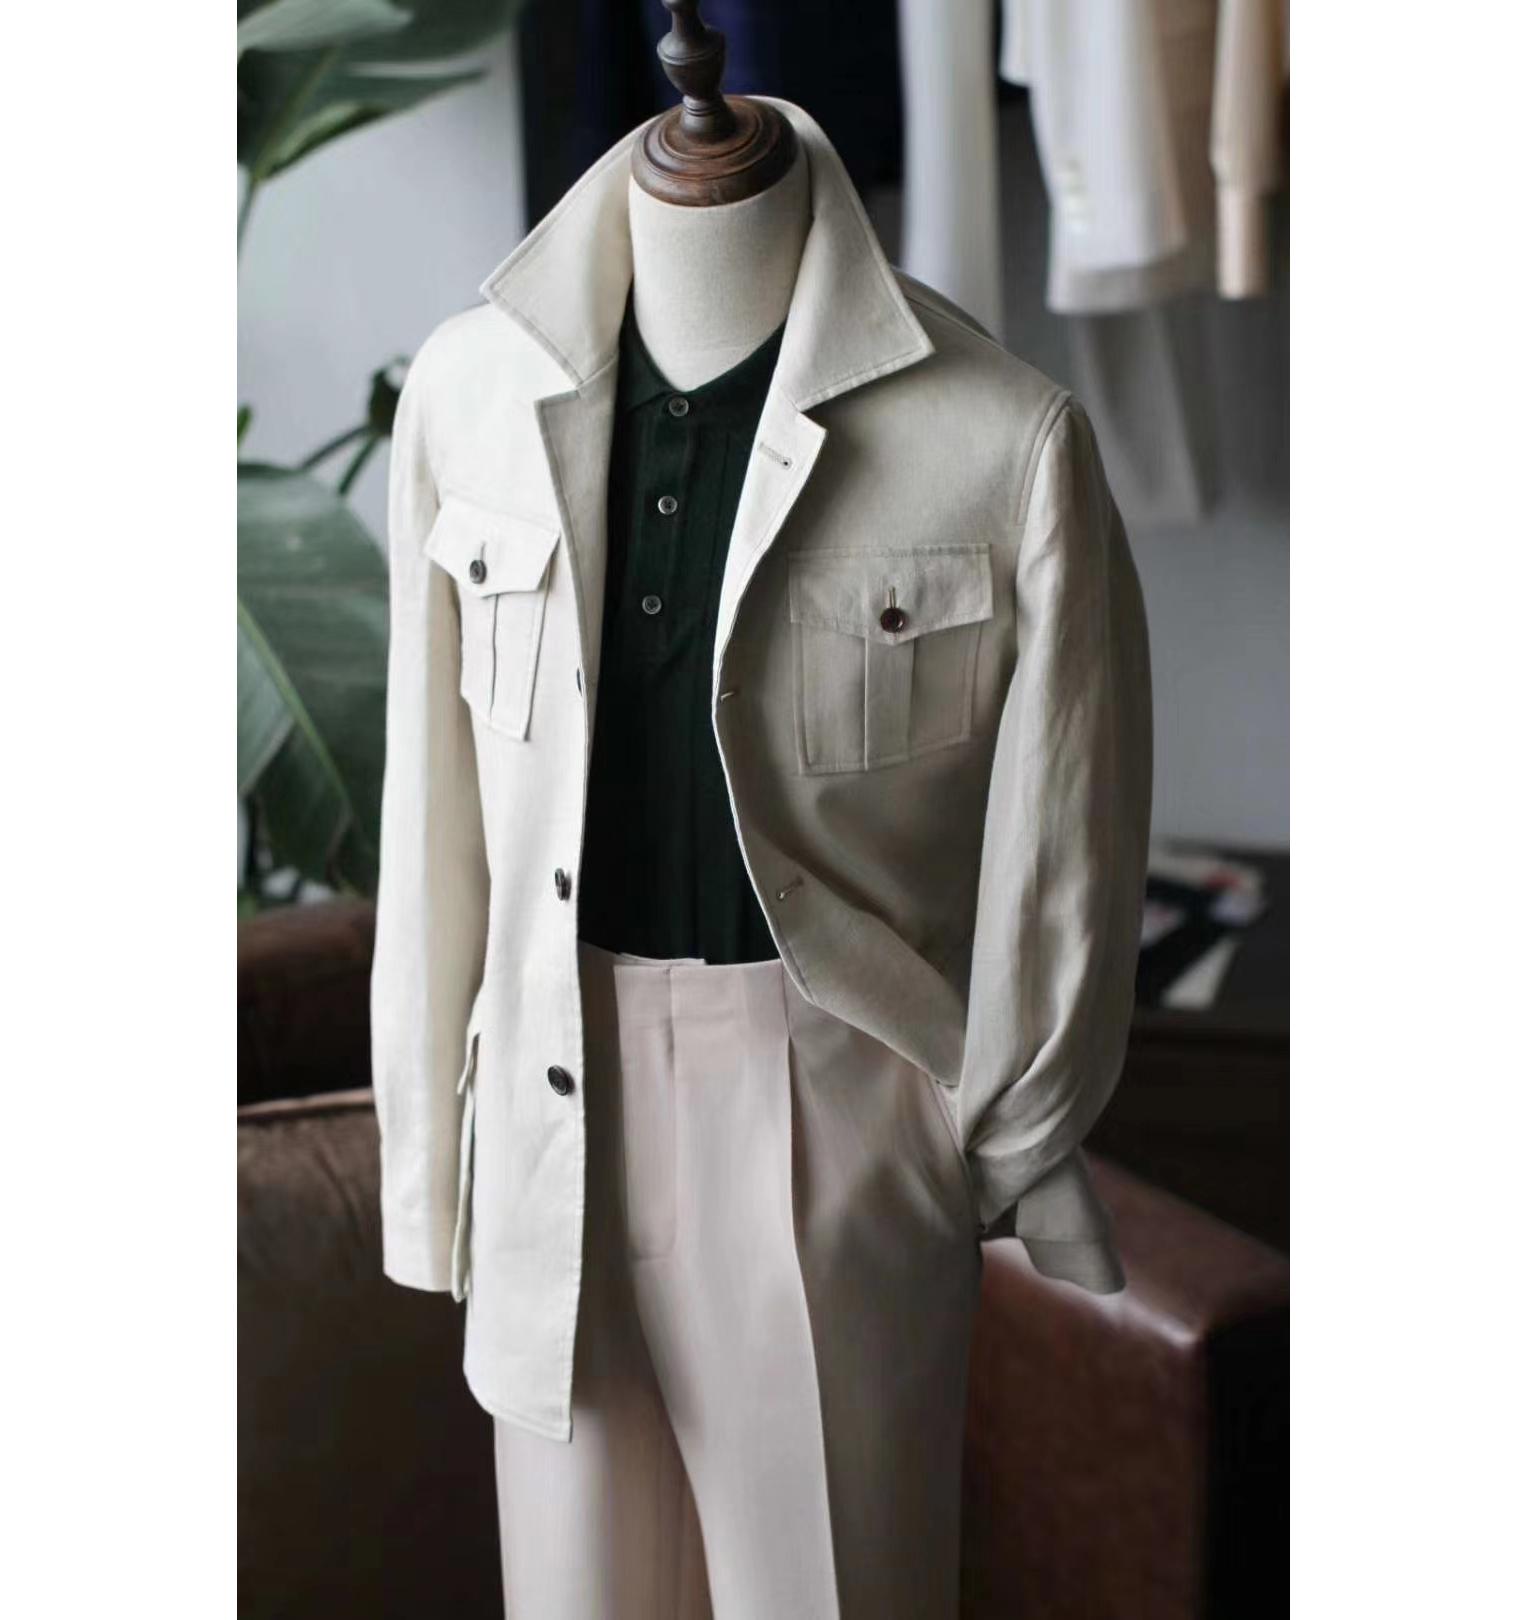 2020 New Fashion Tailored Wool Safari Suits For Men Buy Safari Suit Blazer Sex Punjabi Design For Men Product On Alibaba Com